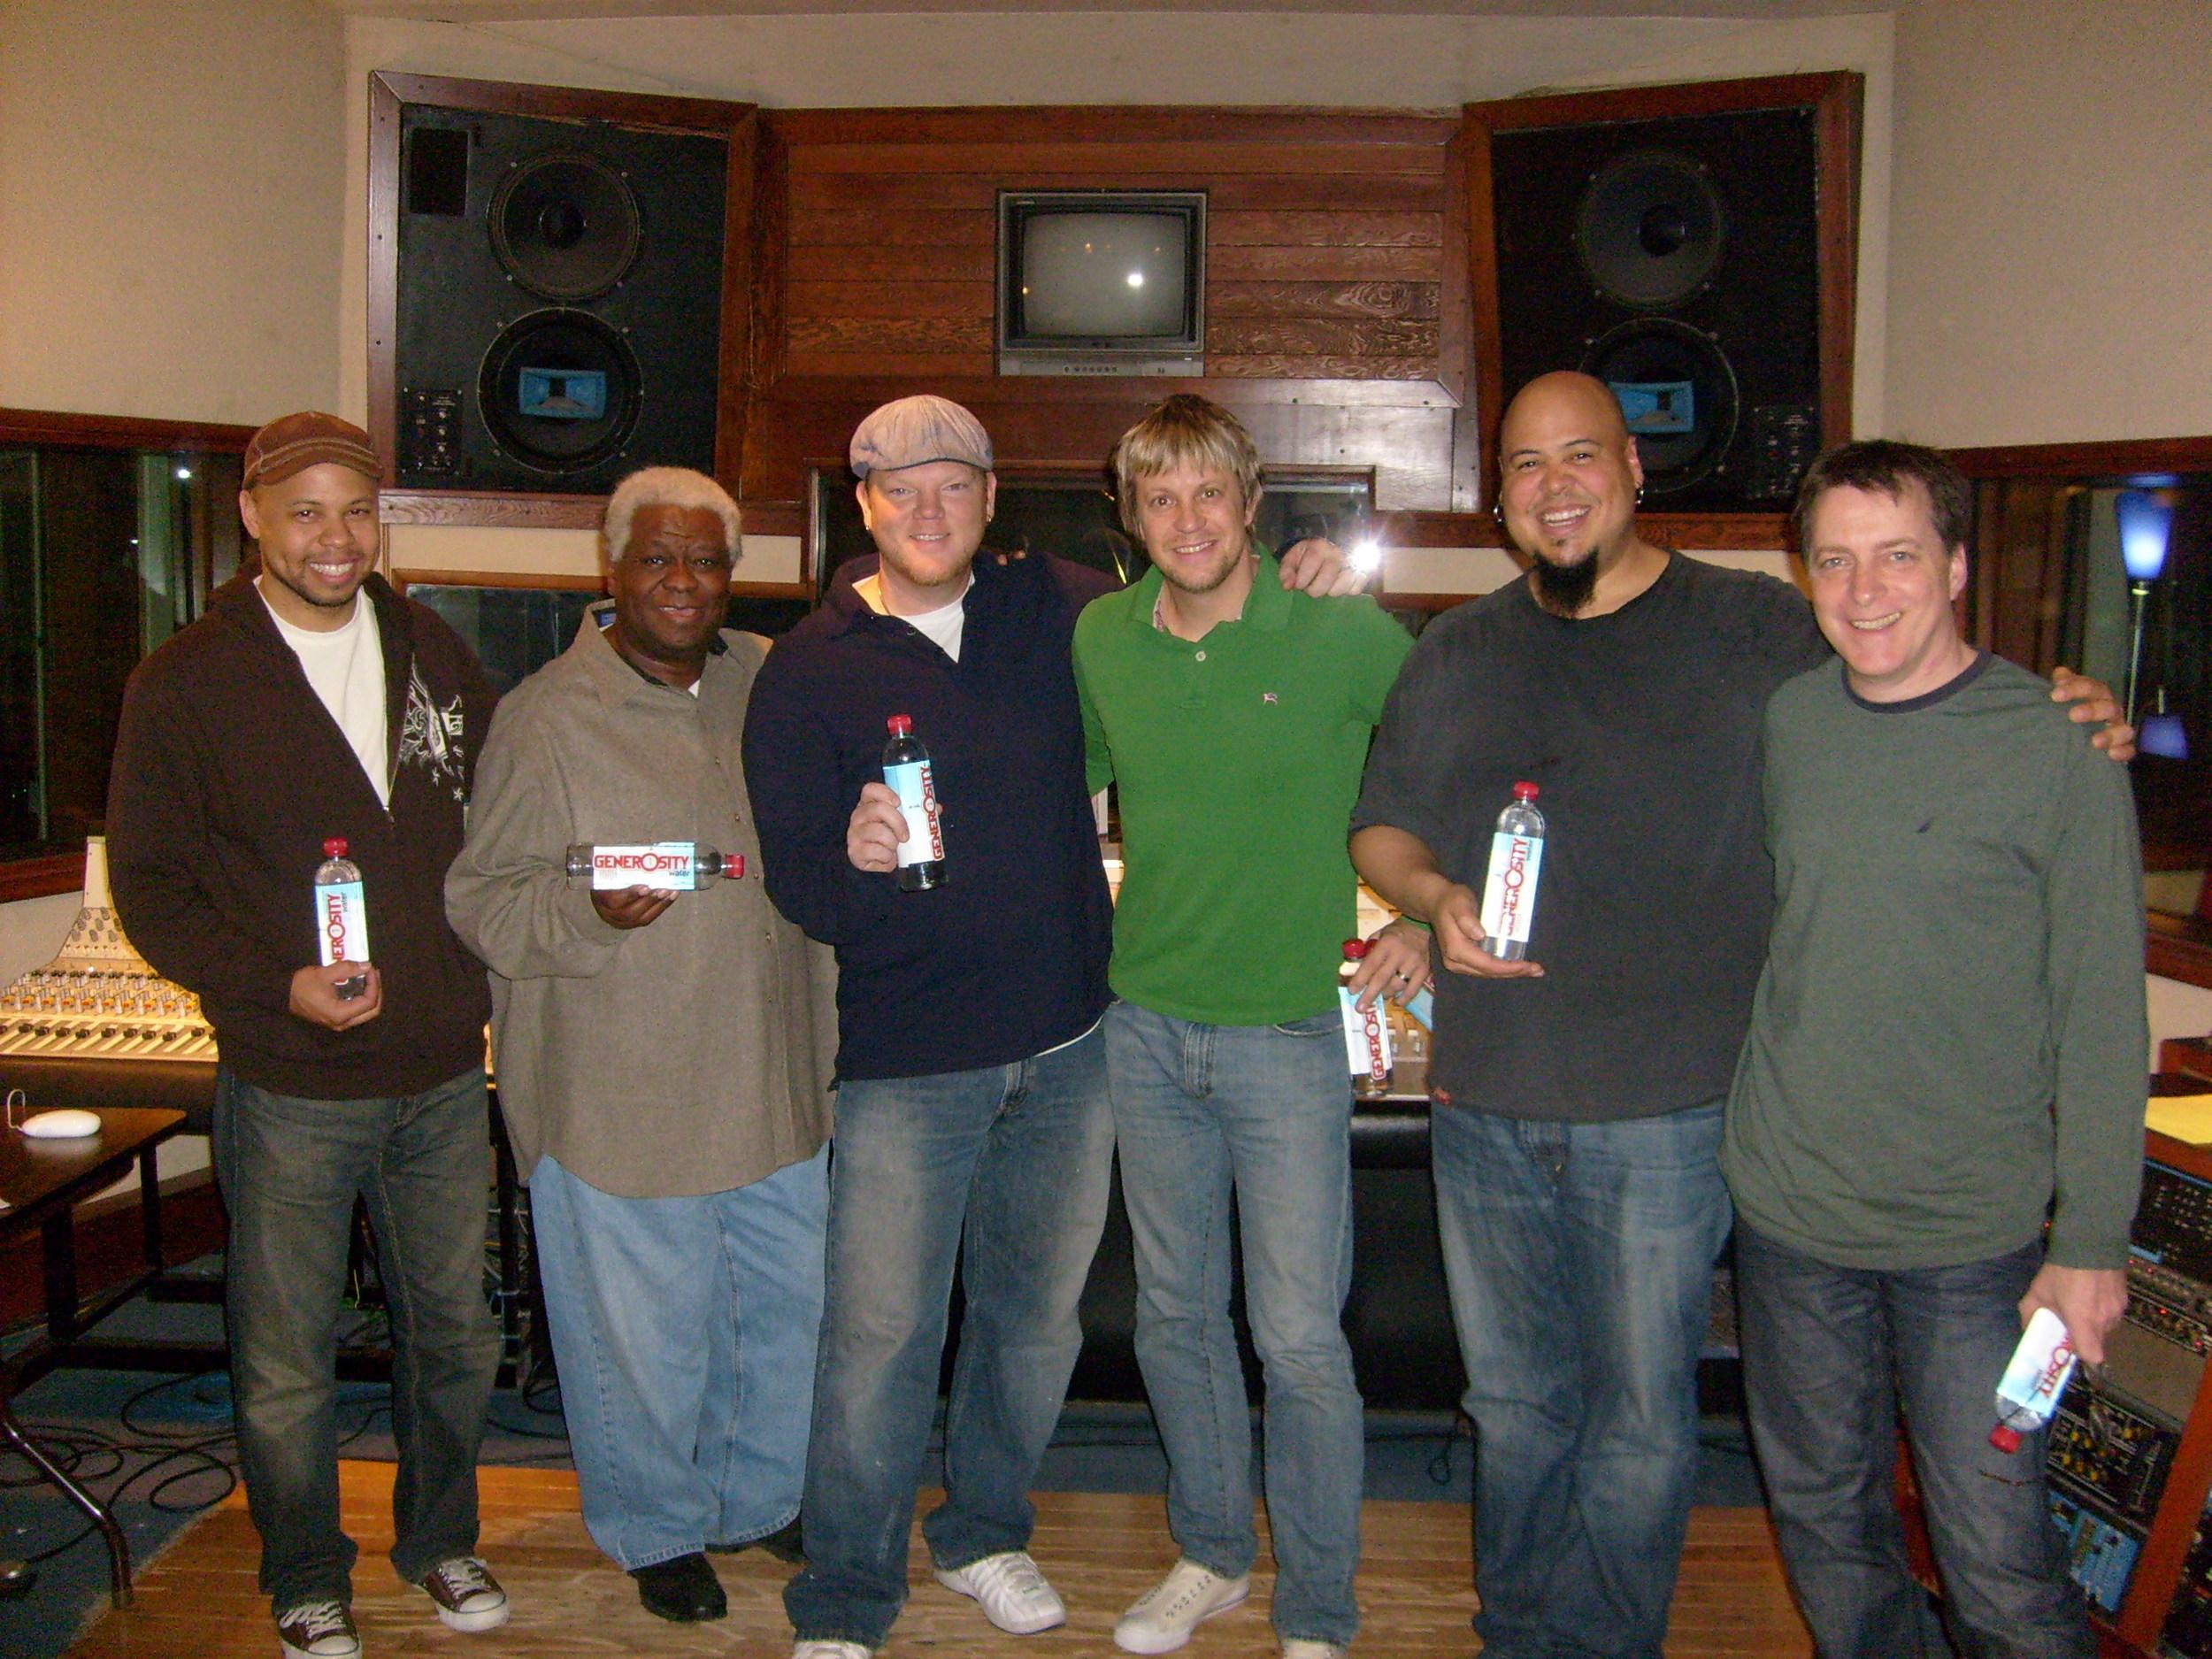 recording Generosity Water Project w/ Chris James, Abe Laboriel Sr., Dan Lutz, Abe Laboriel Jr. & James Harrah @ Stagg St. Studios Van Nuys, December 2008